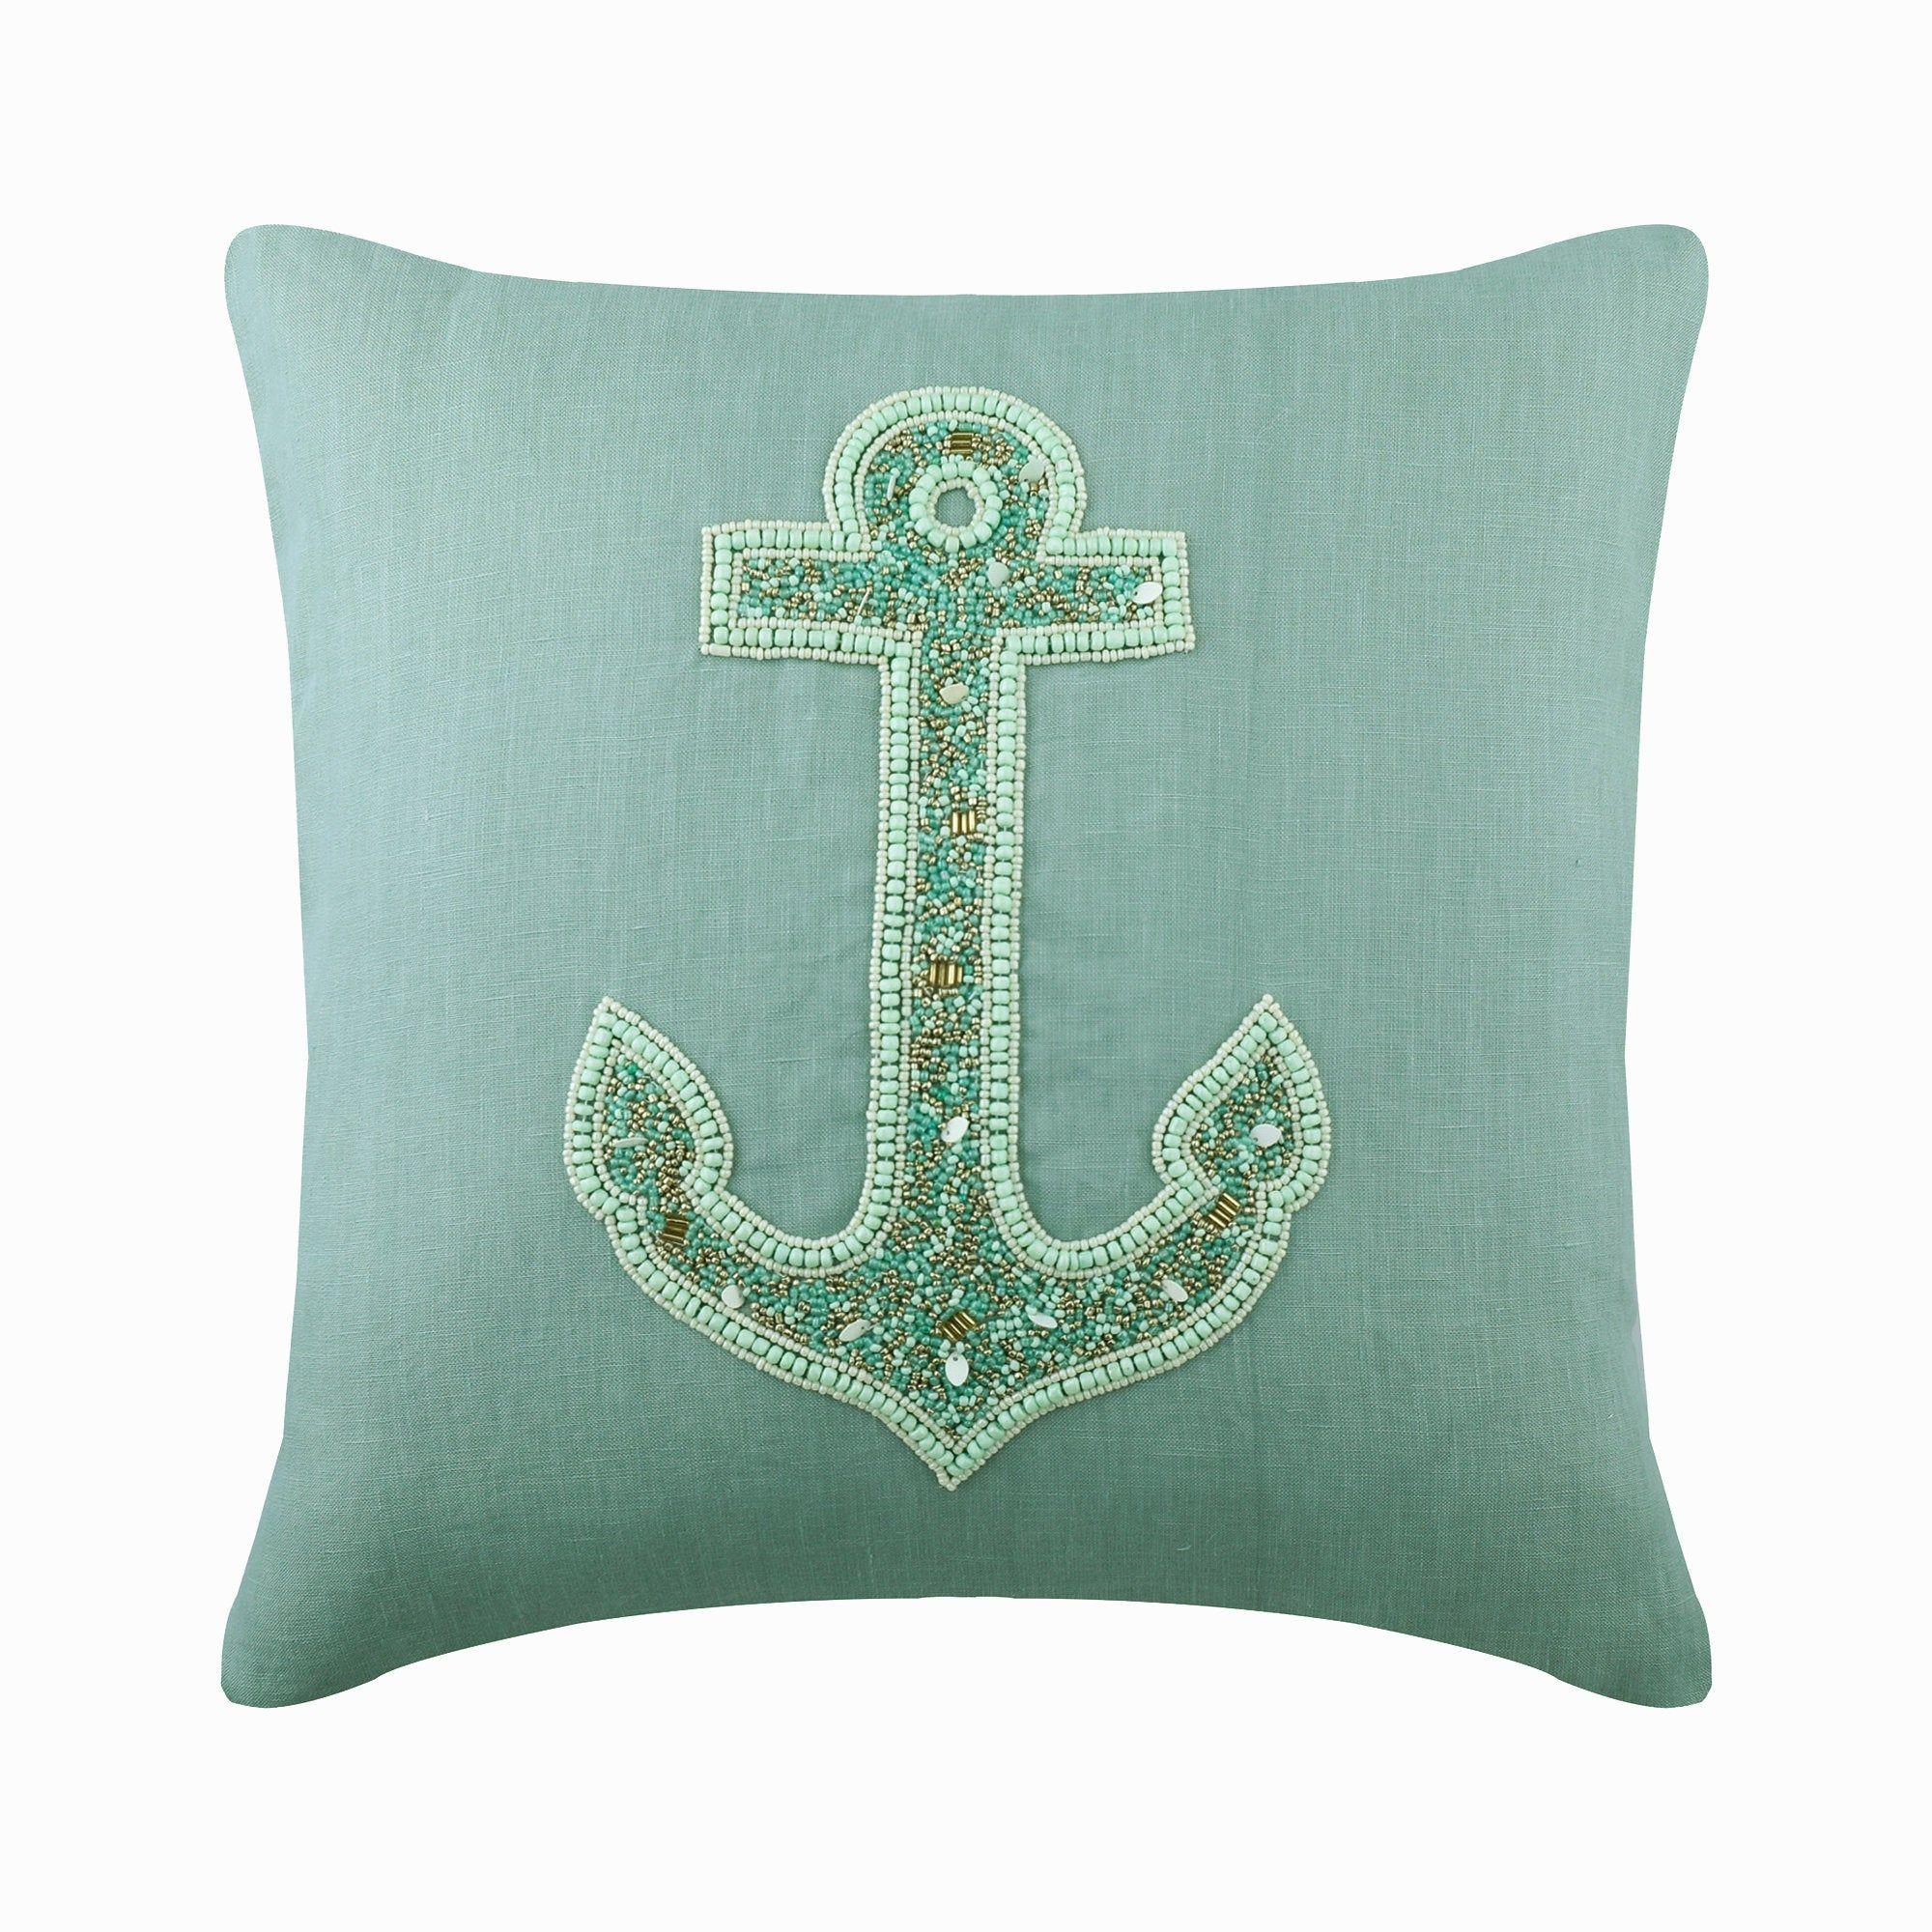 100 Coastal By The Sea Decor Ideas In 2021 Sea Decor Decorative Throw Pillow Covers Throw Pillows